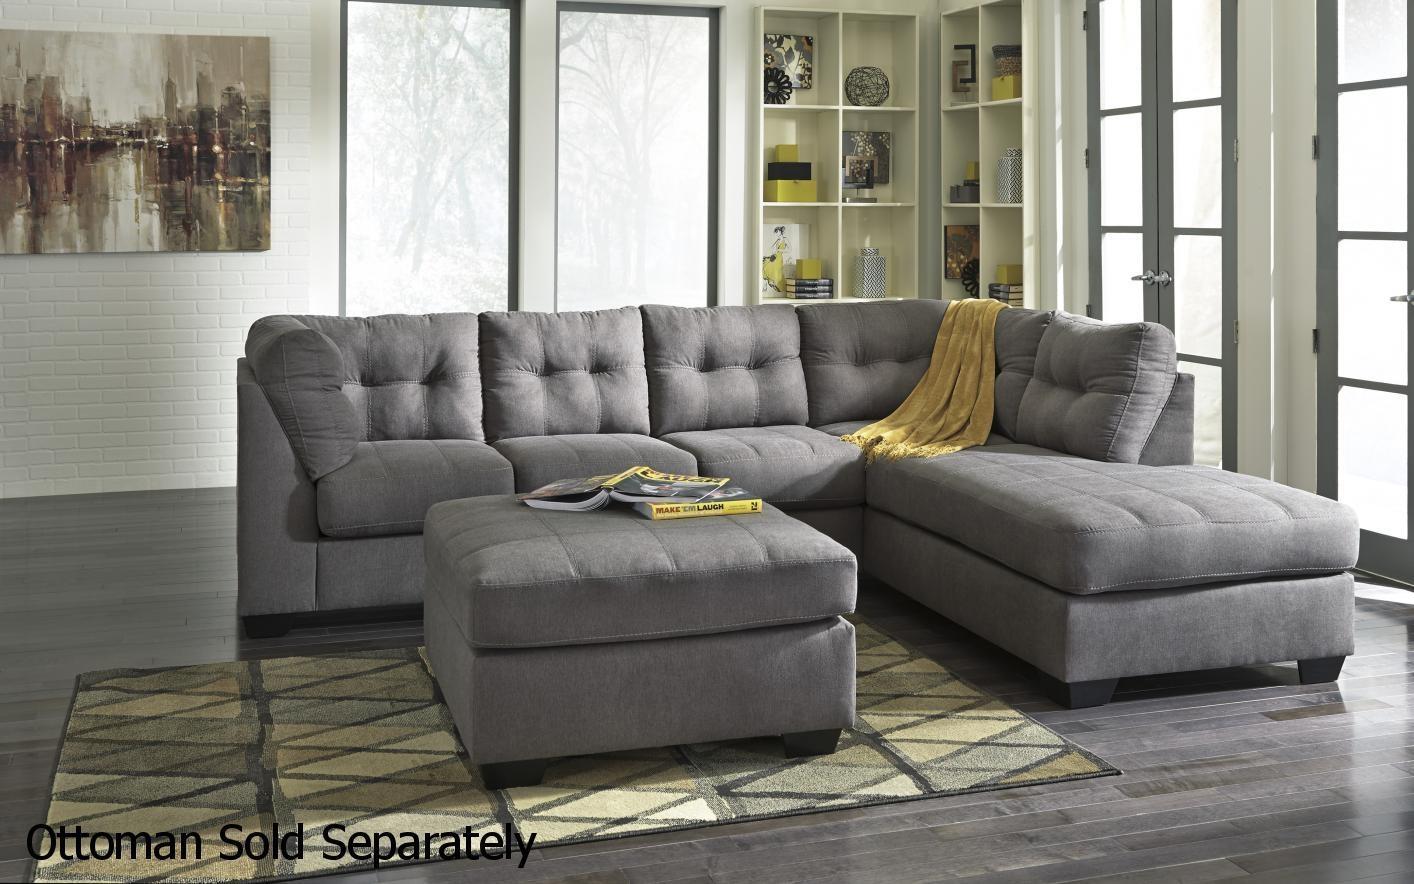 Sofas Center : Ashleyectionalofaofas With Chaise Loungeashley With Ashley Furniture Grenada Sectional (Image 15 of 15)